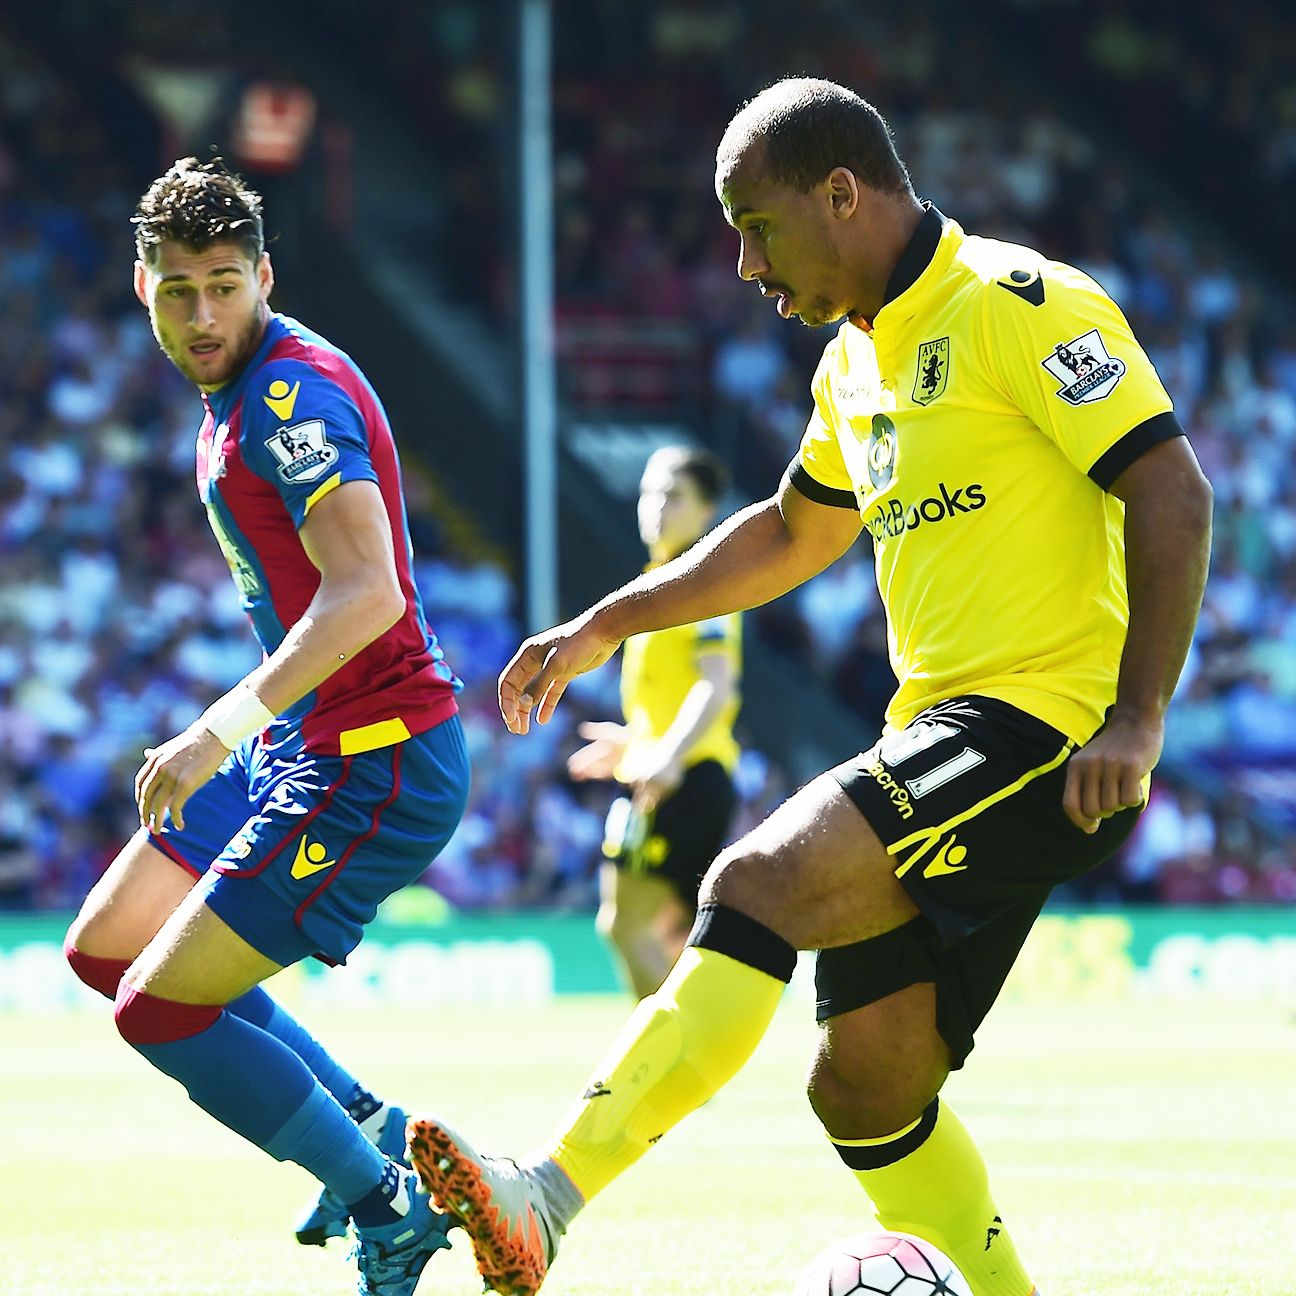 Gabriel Agbonlahor is off to an inauspicious start for Aston Villa.